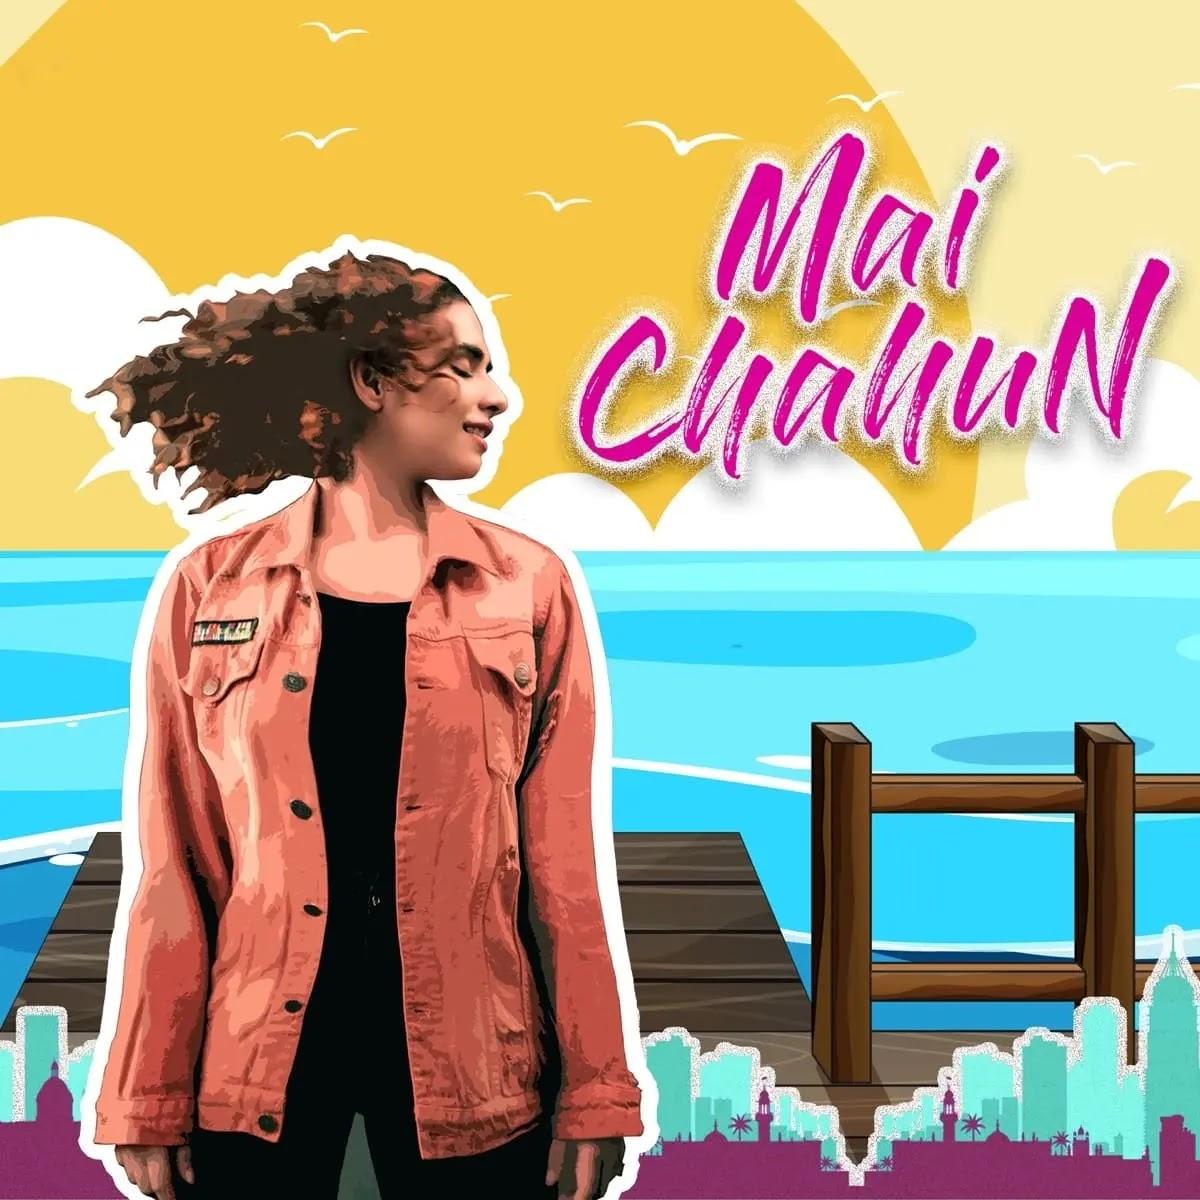 Mai Chahun Shruti Sharma Song Download Mp3 320kbps